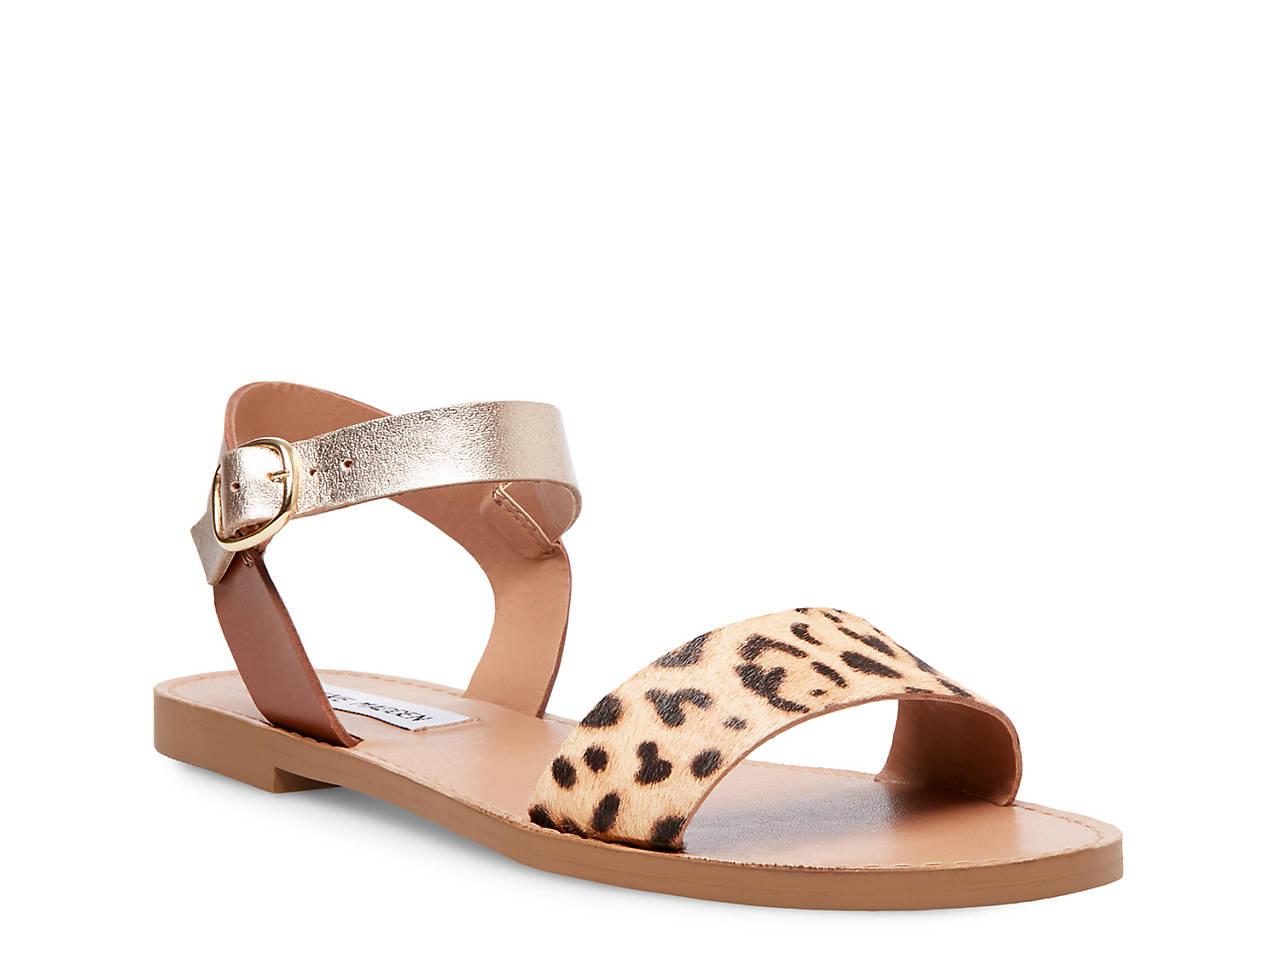 1a1a5c755 Steve Madden Donddi Sandal Women's Shoes | DSW